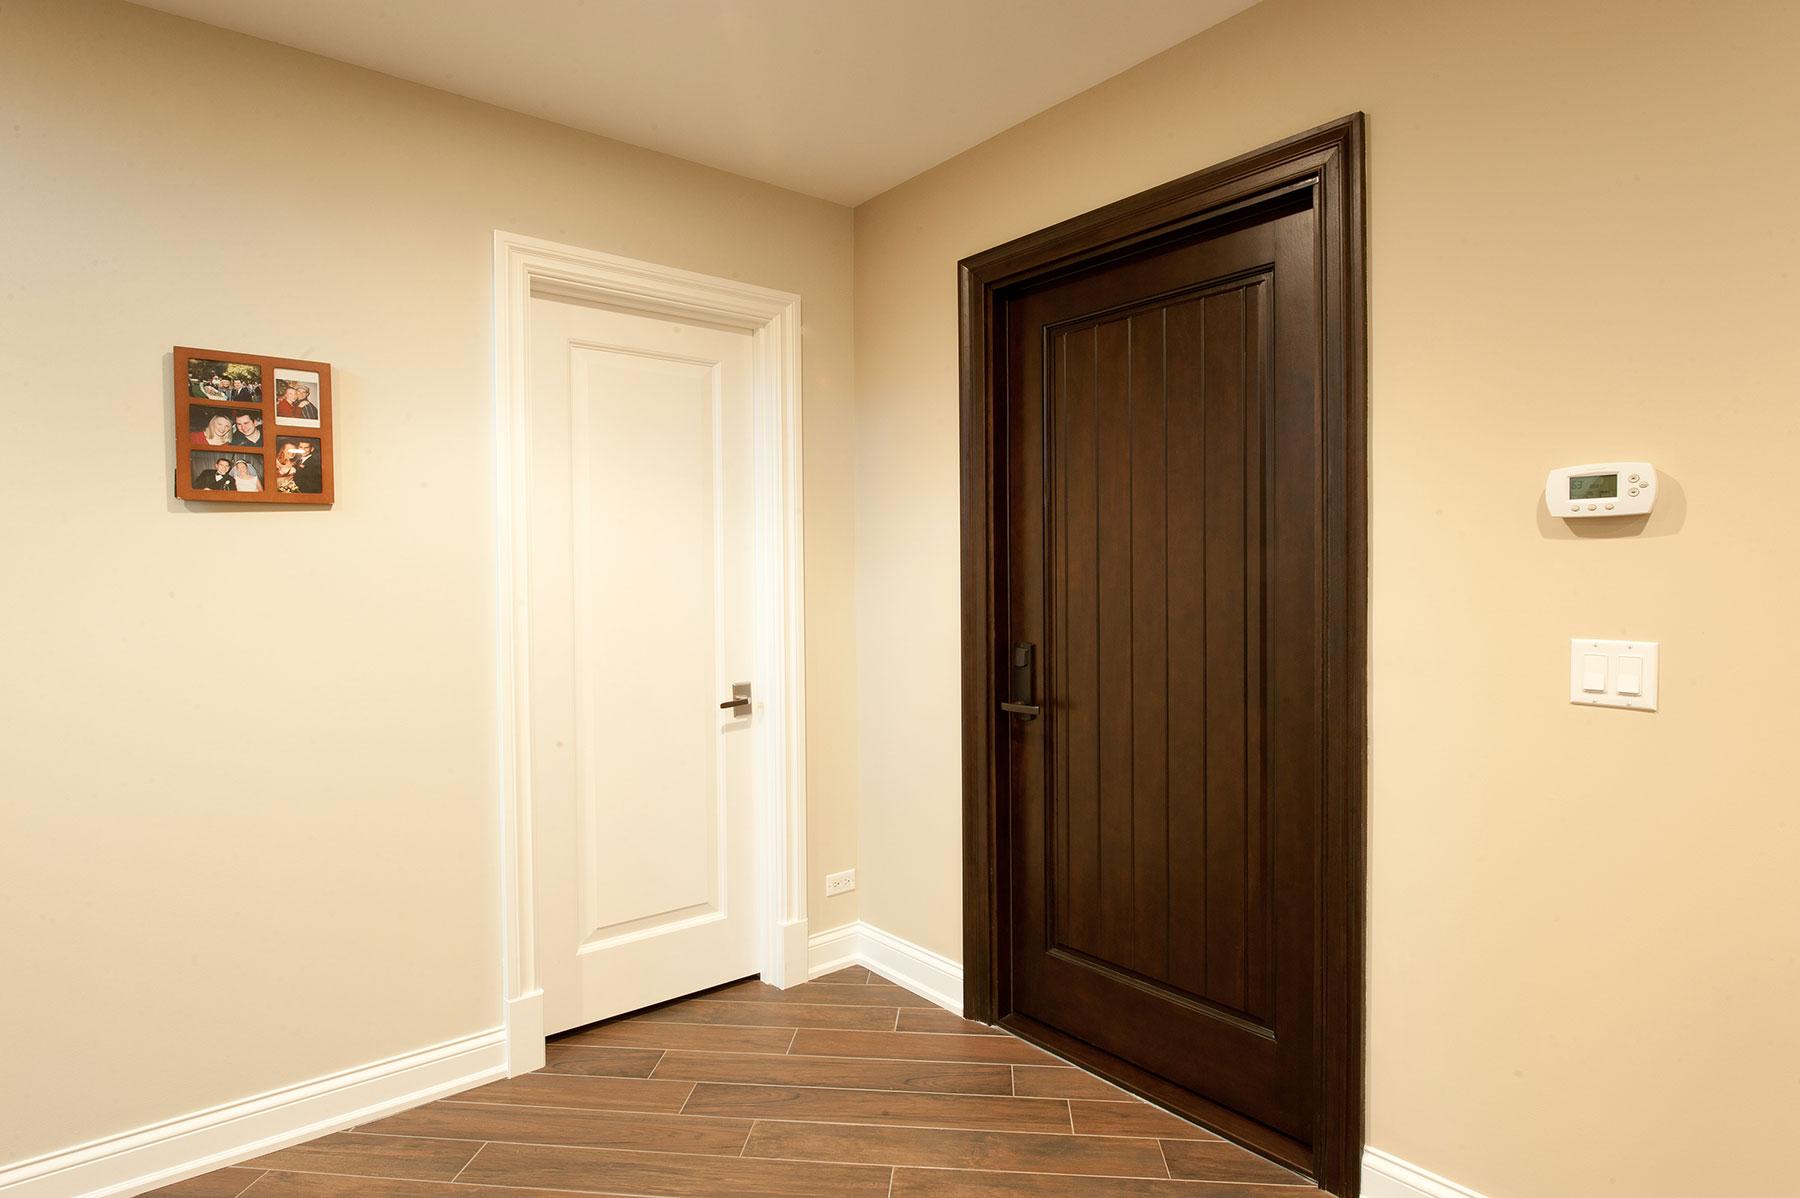 Custom Wood Interior Doors | Custom Interior Doors, 1 Raise Panel, Paint Grade and Stain Grade  - Glenview Doors - Custom Doors in Chicago